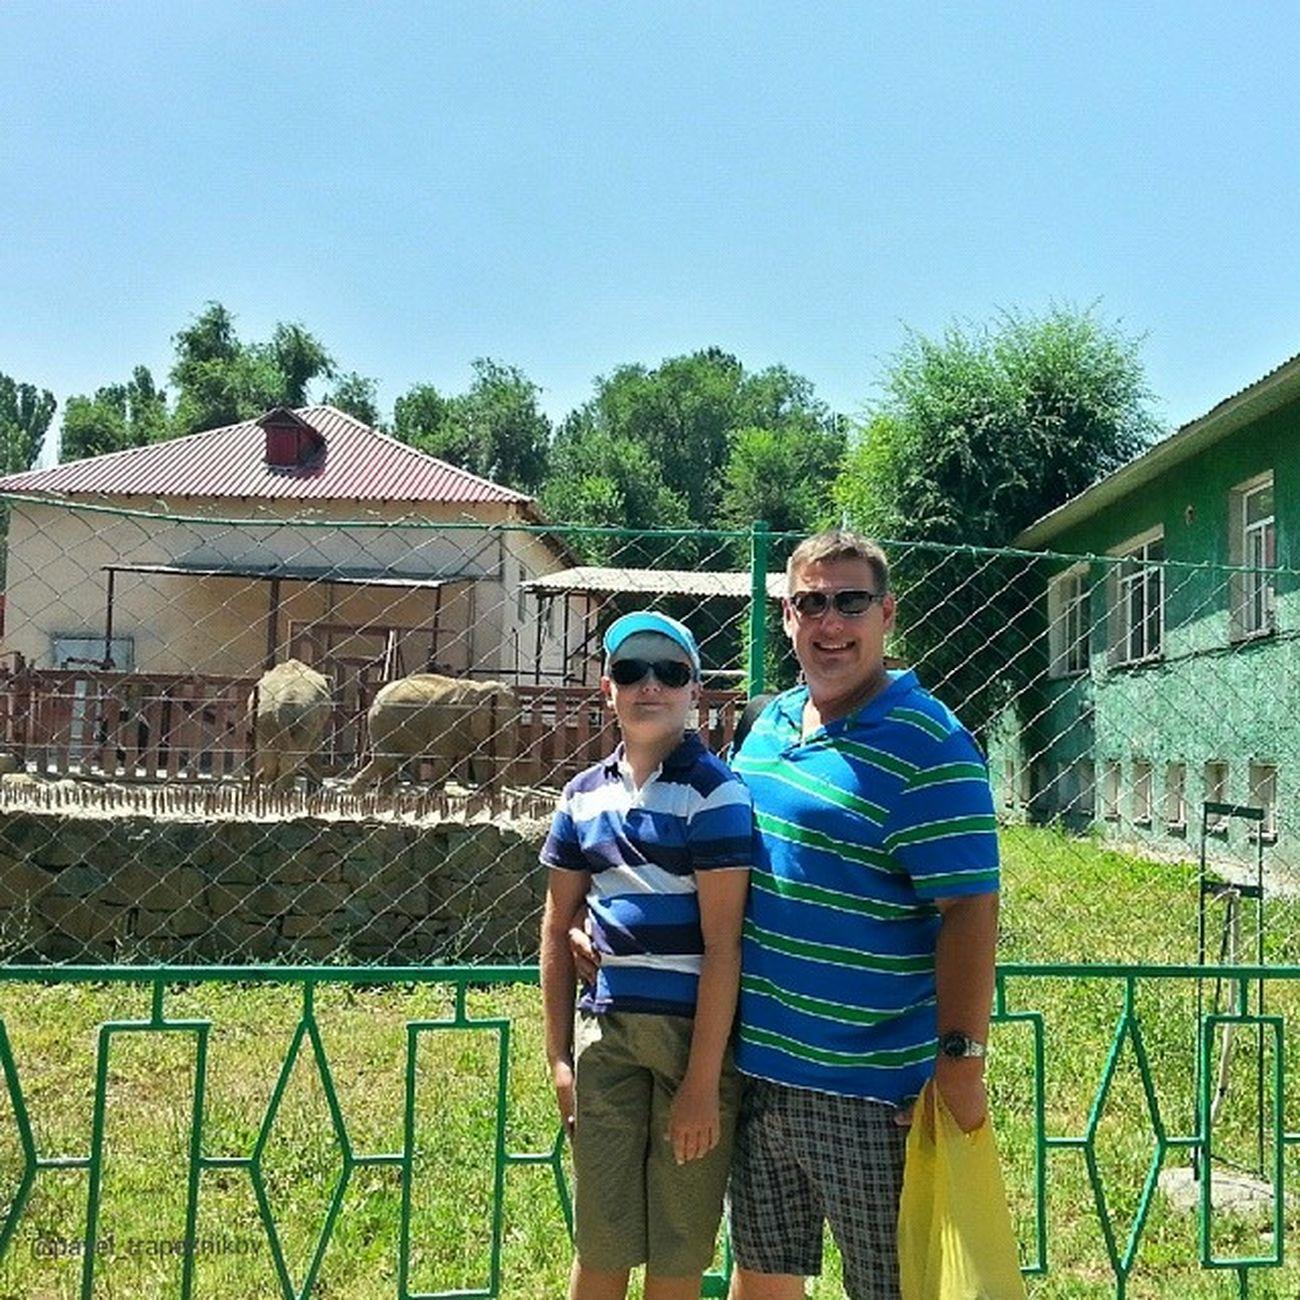 20140730 , Казахстан , алматы . Алматинский зоопарк . Мы и слоны:-)/ Kazakhstan, Almaty. Almaty Zoo. We and elephants:-)